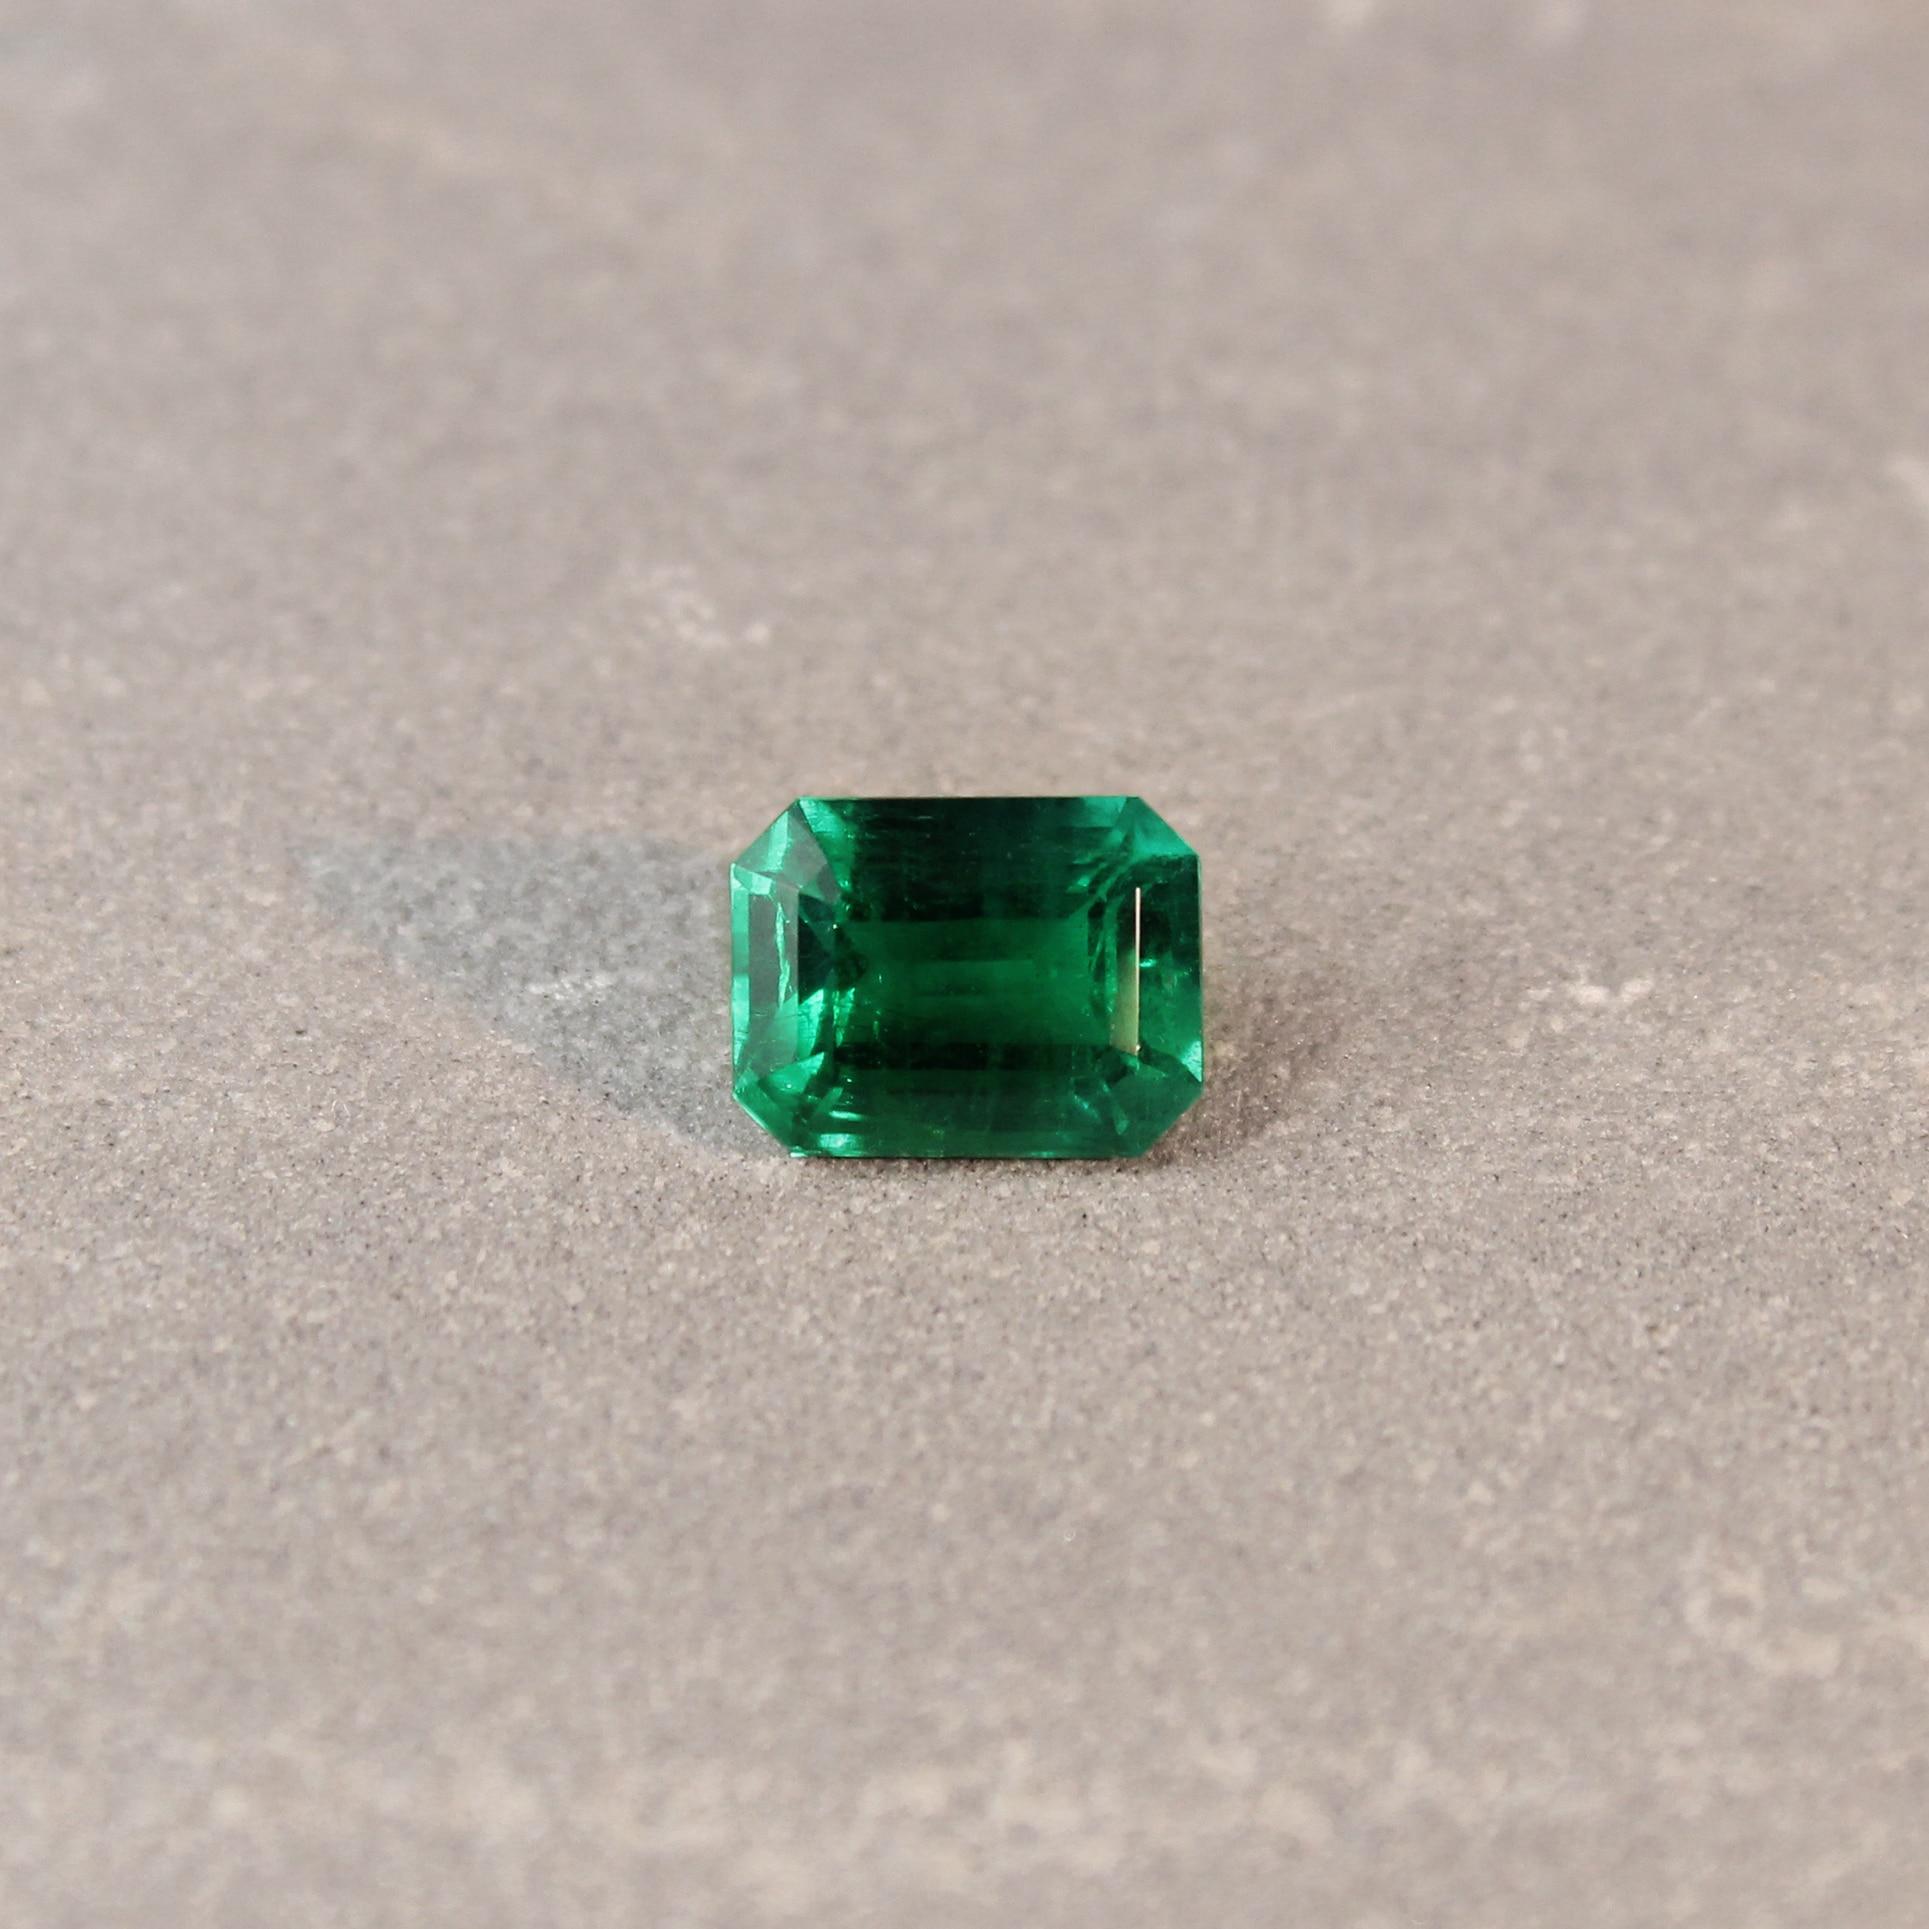 2.47 ct green octagon emerald